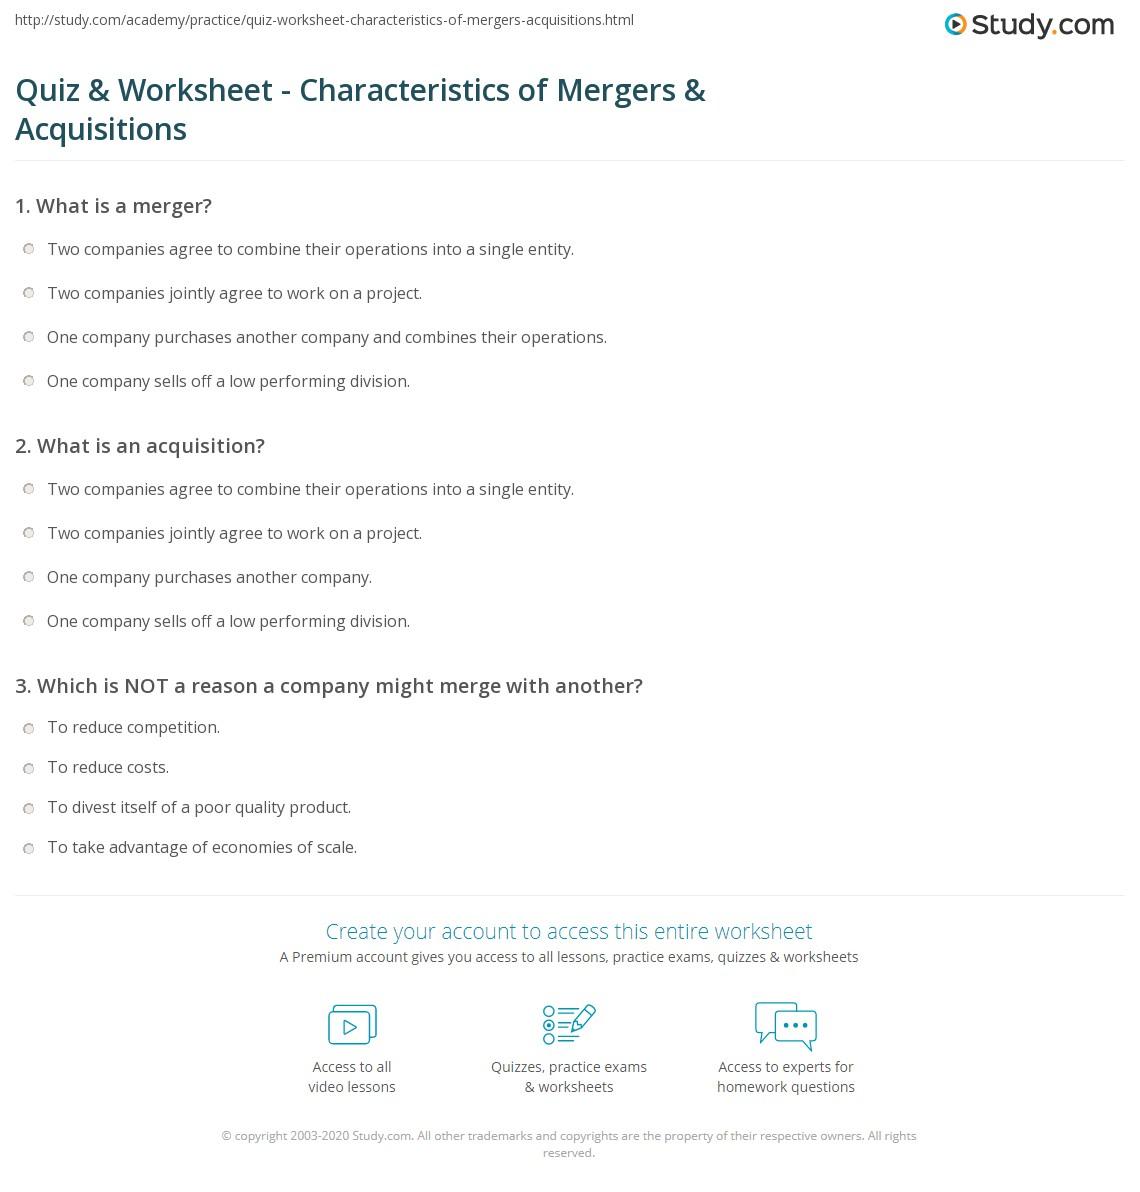 quiz worksheet characteristics of mergers acquisitions study com